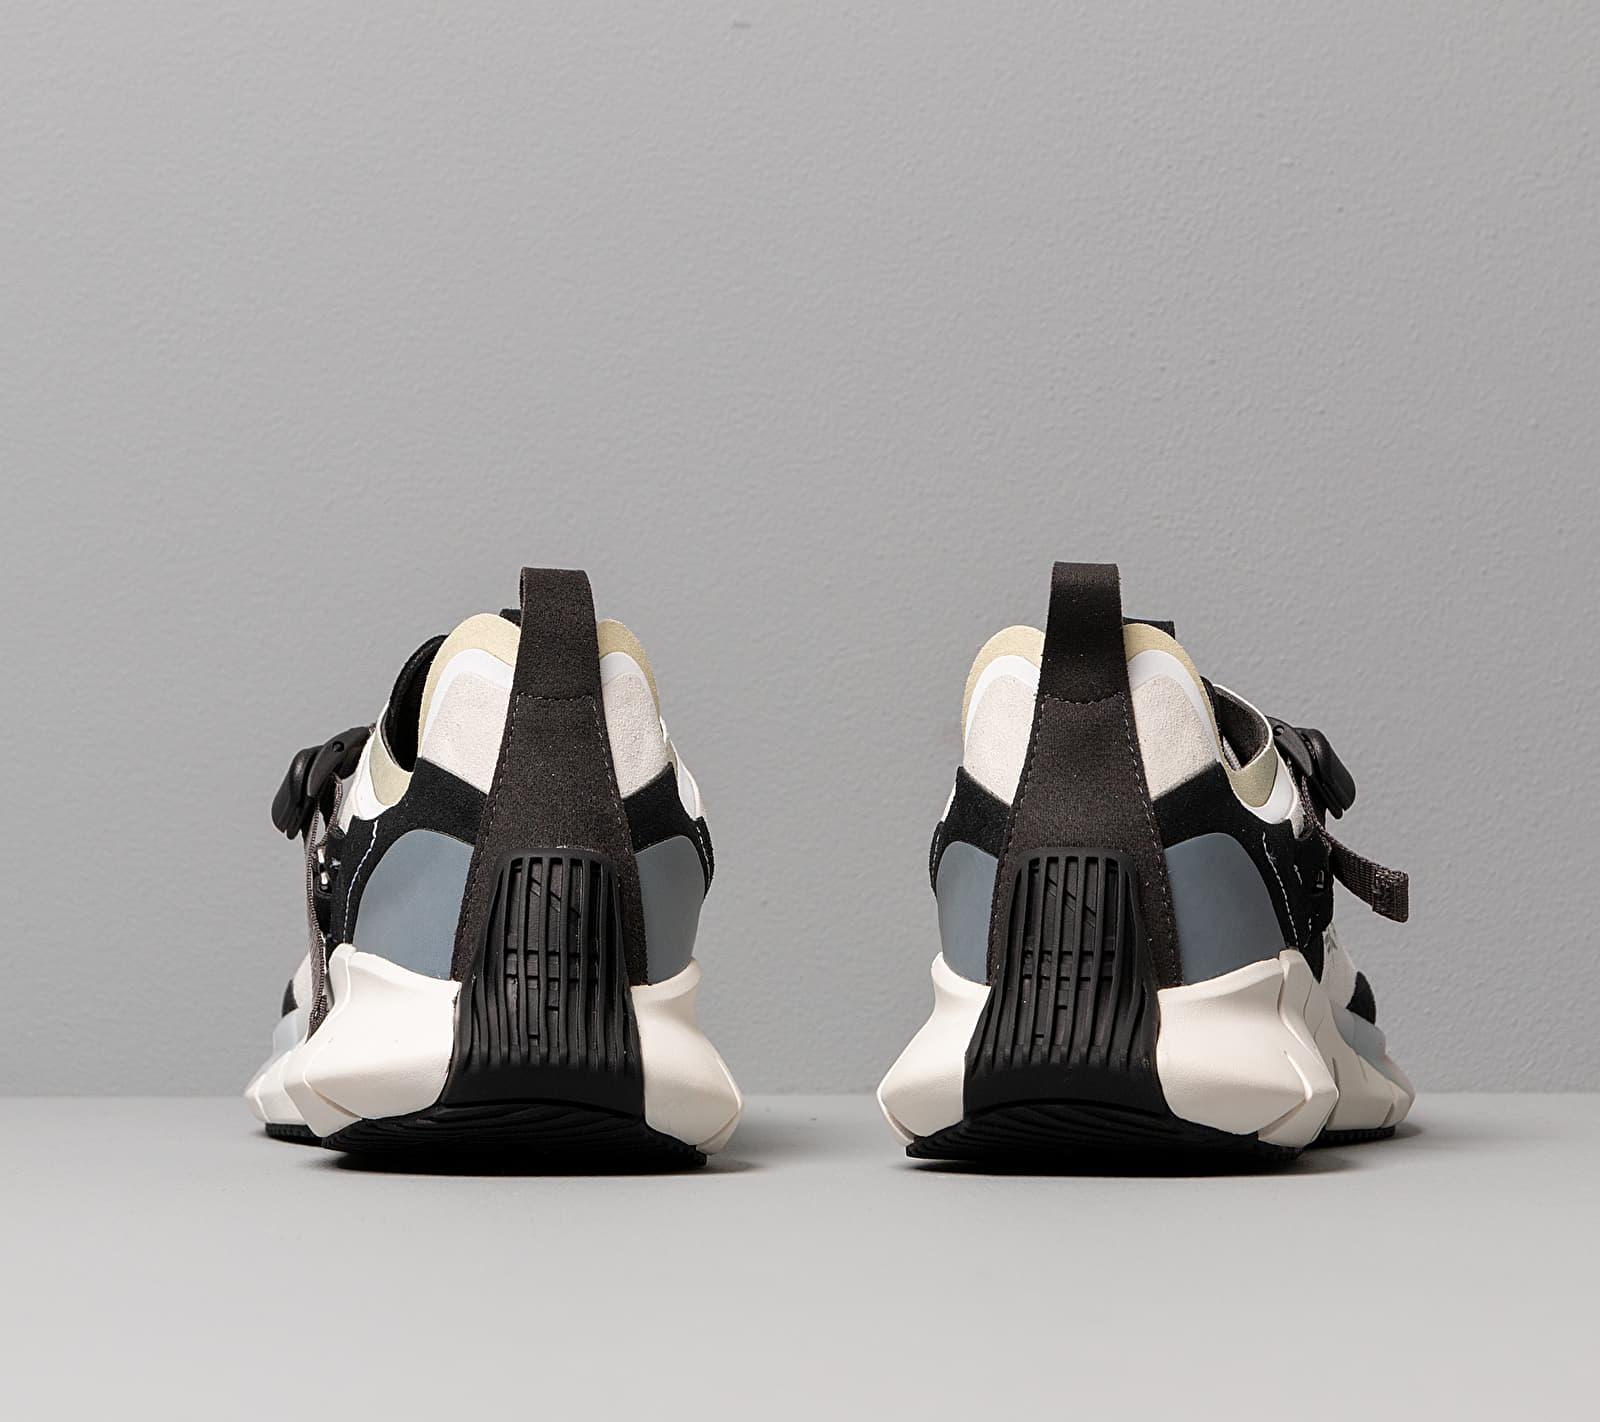 Reebok Zig Kinetika Concept_Type 1 White/ Black/ Lunar Blue